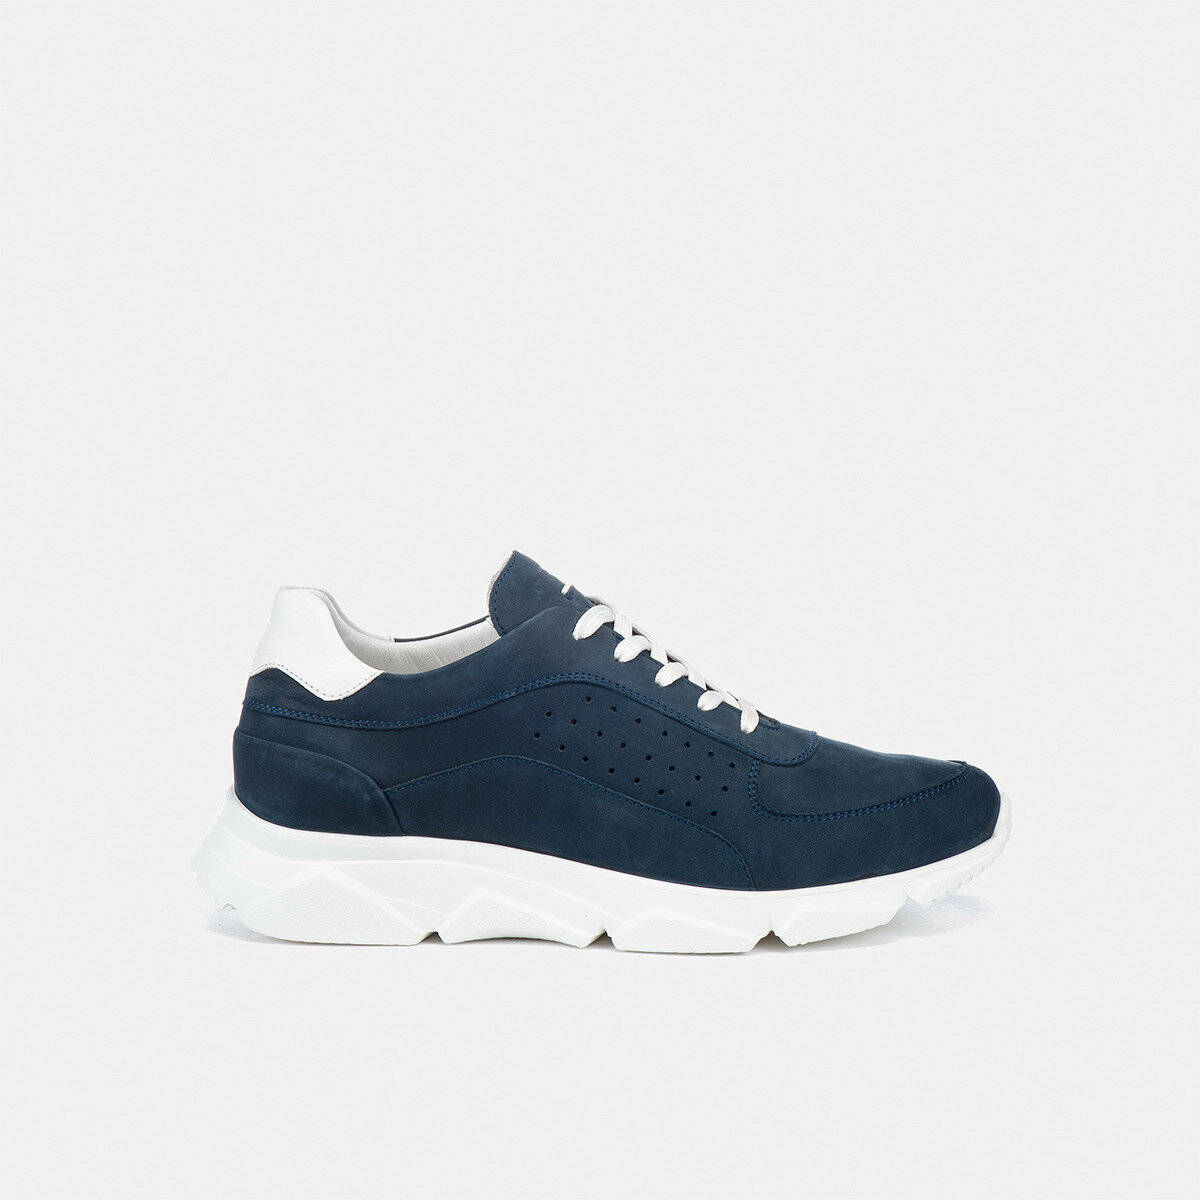 BERRET NAVY BLUE Man Sneakers